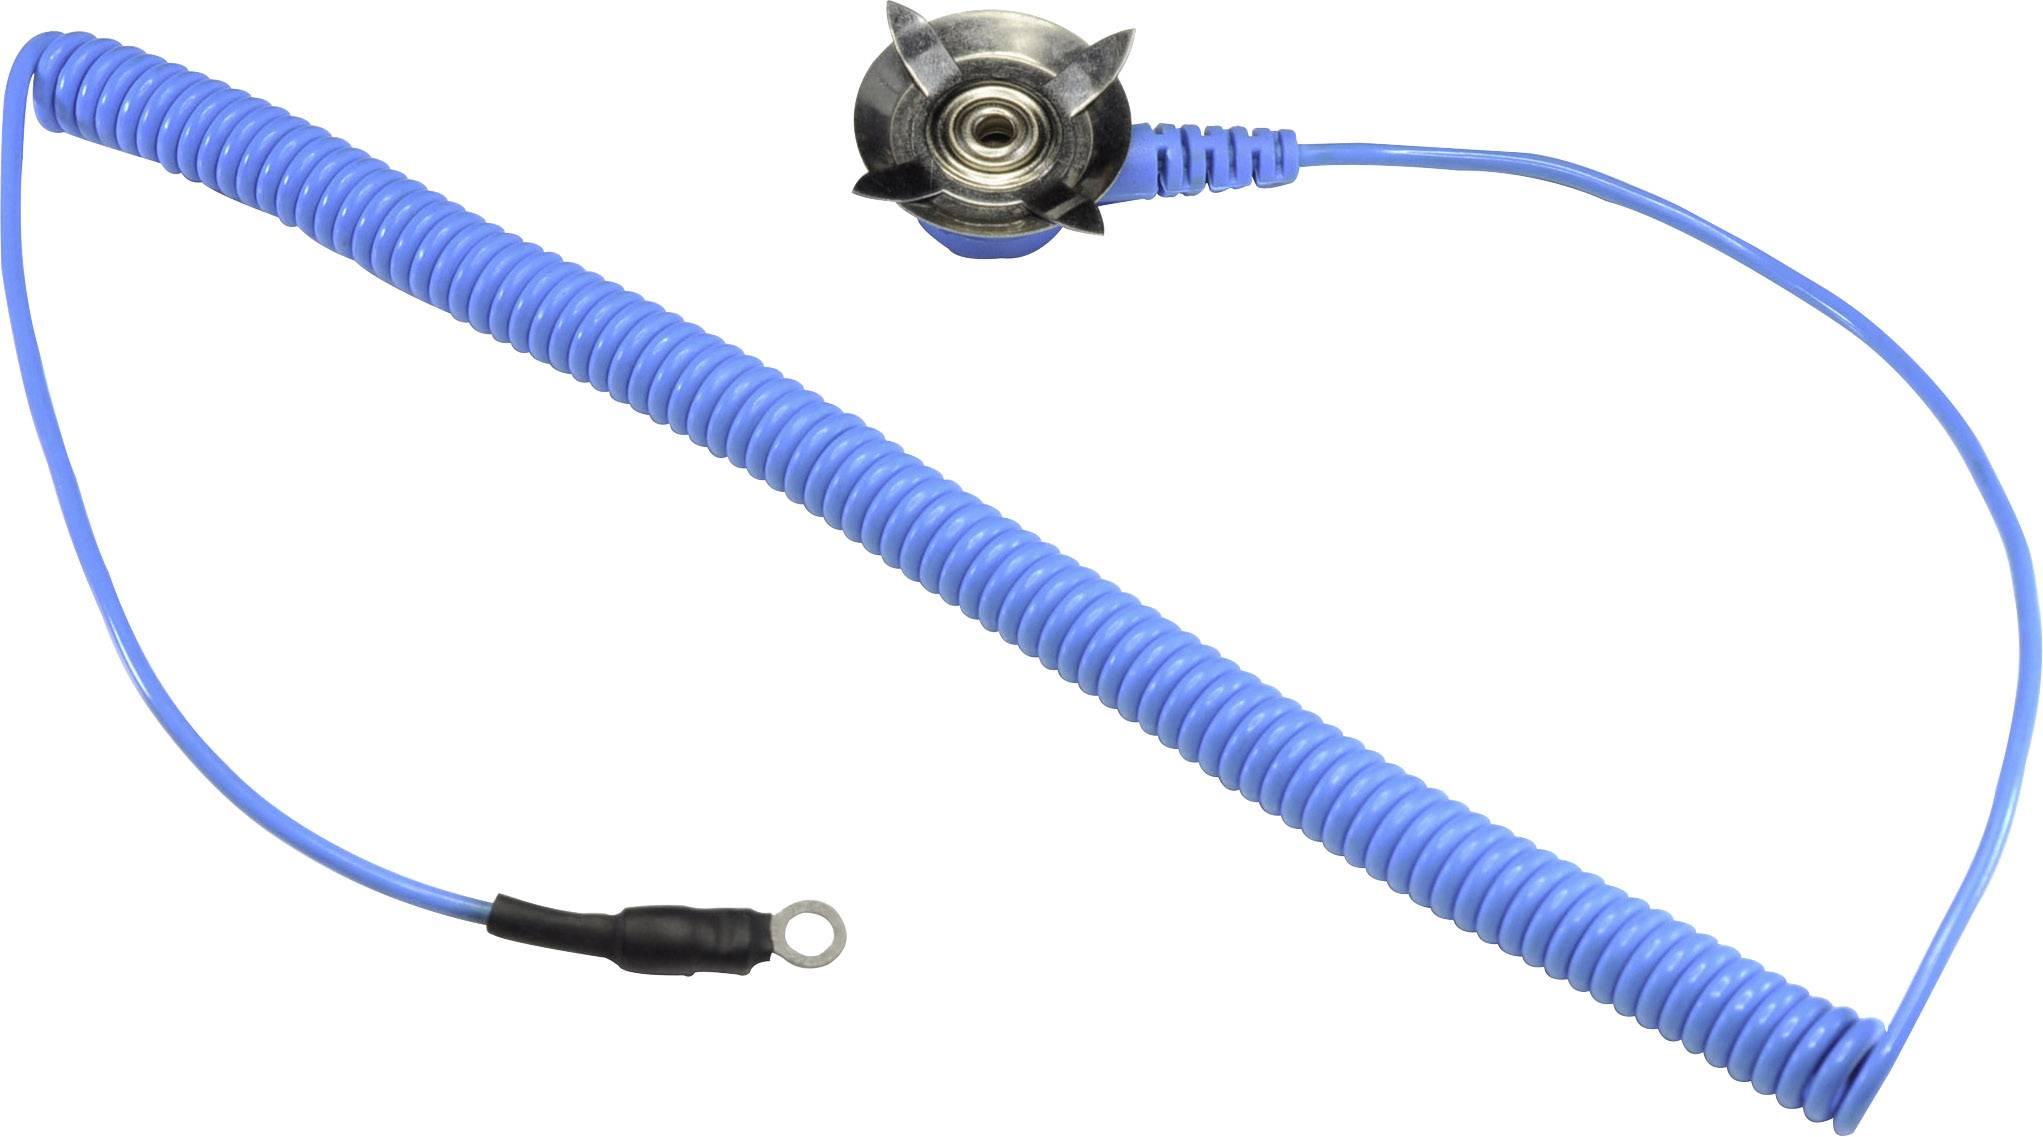 ESD zemnicí kabel k rohoži TRU COMPONENTS EkA-183-AD-R, 1.83 m